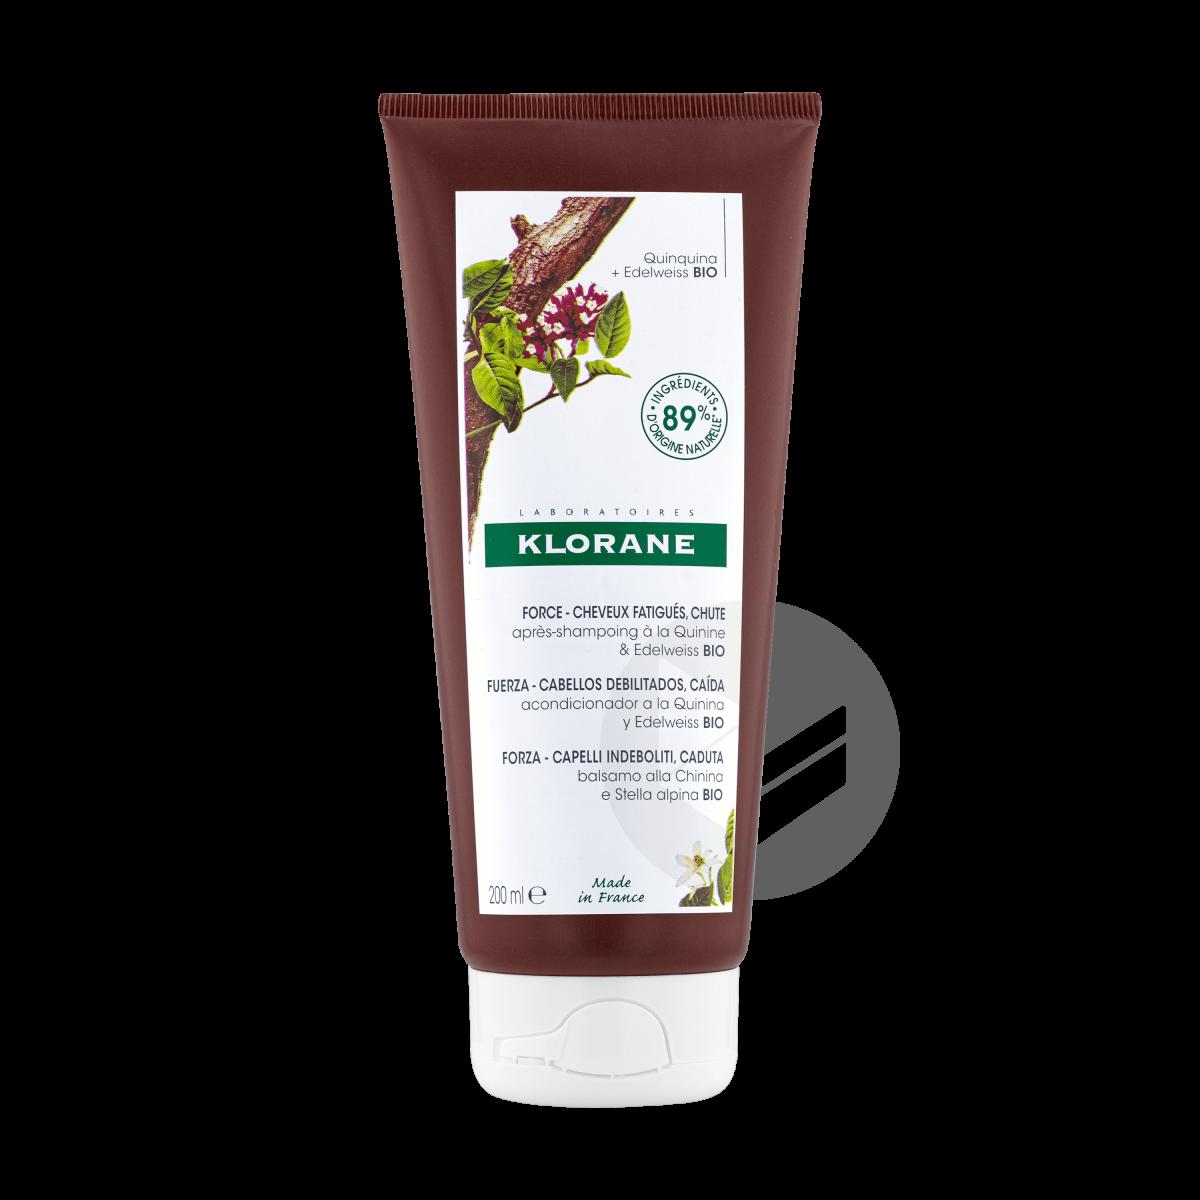 Après-shampoing fortifiant à la Quinine & Edelweiss BIO 200ml